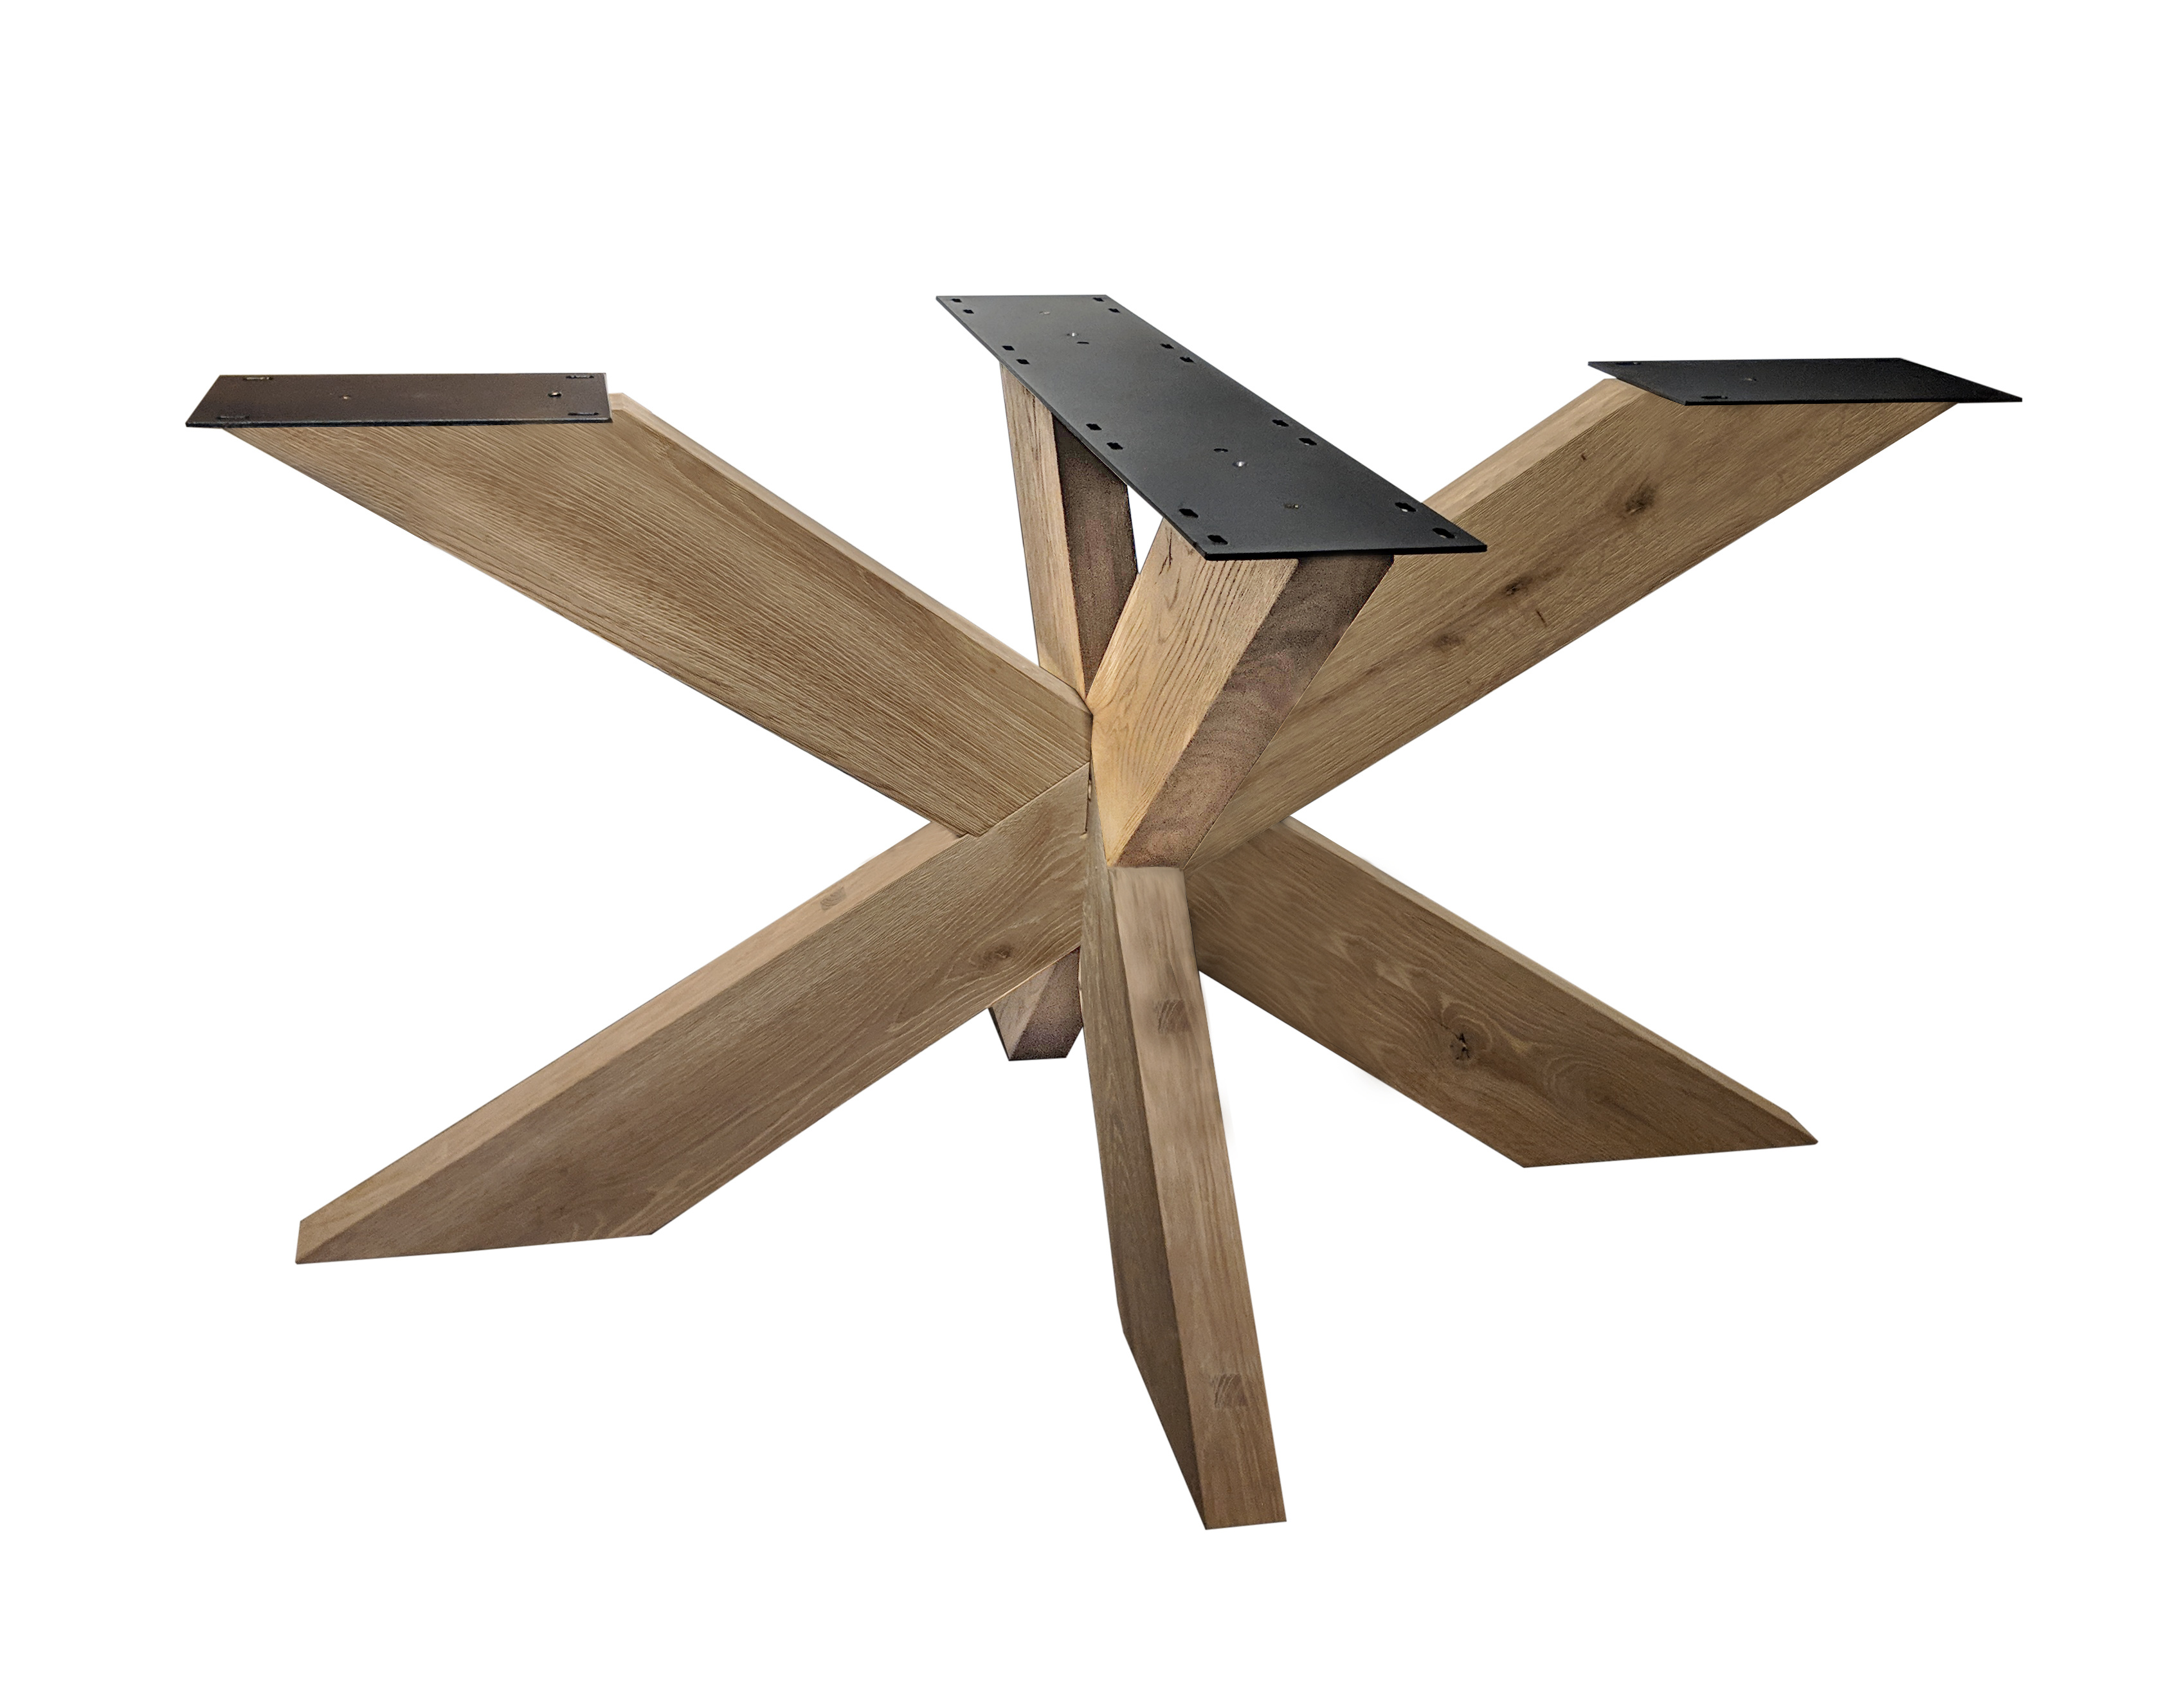 Eiken matrix 3D tafelpoot 16x6 cm - 72 cm hoog - 140x90 cm  - Rustiek licht geborsteld - Spin 3D kruis / X-poot - 12% kd Europees eikenhout